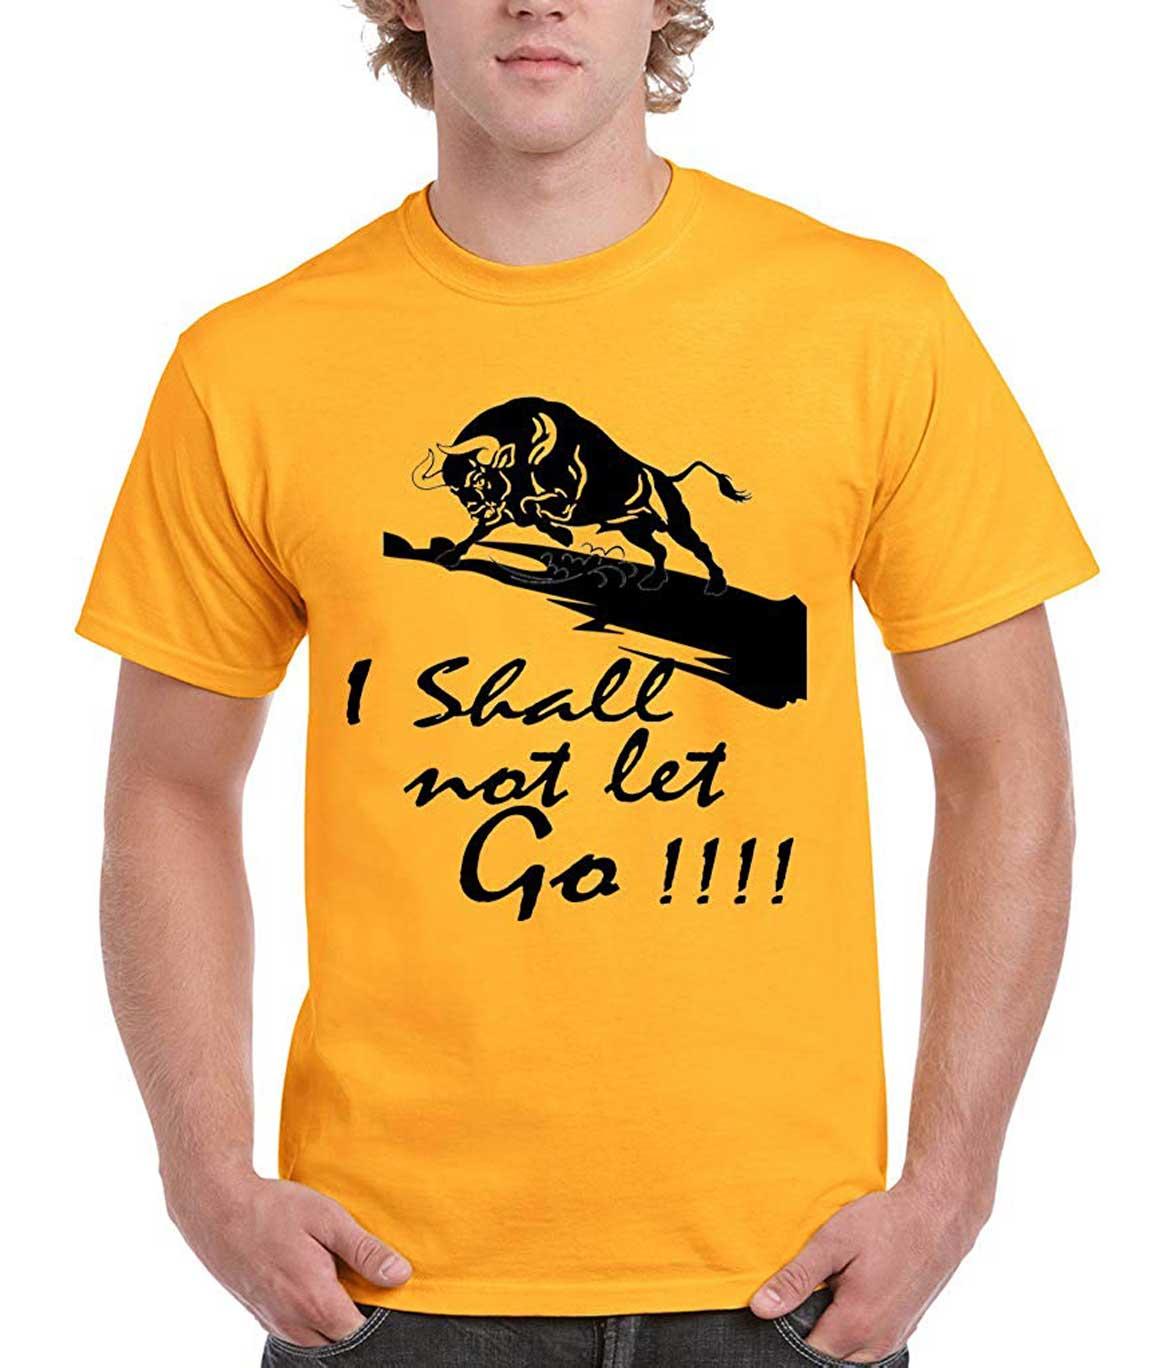 Vestiario Super Dry Fit Printed Round Neck Yellow T-Shirt